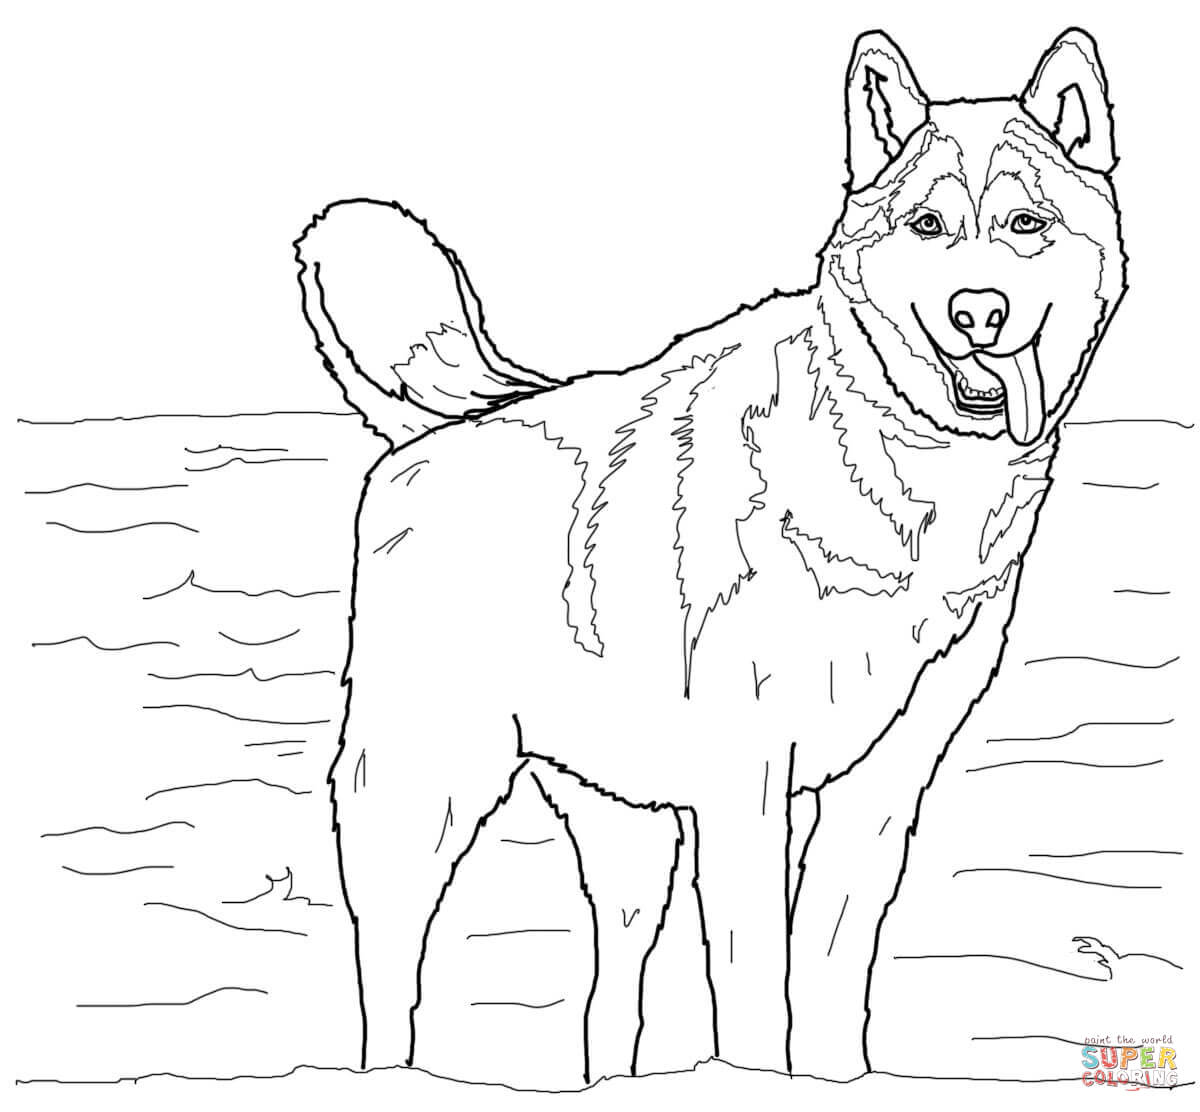 Ausmalbild Siberian Husky Ausmalbilder kostenlos zum